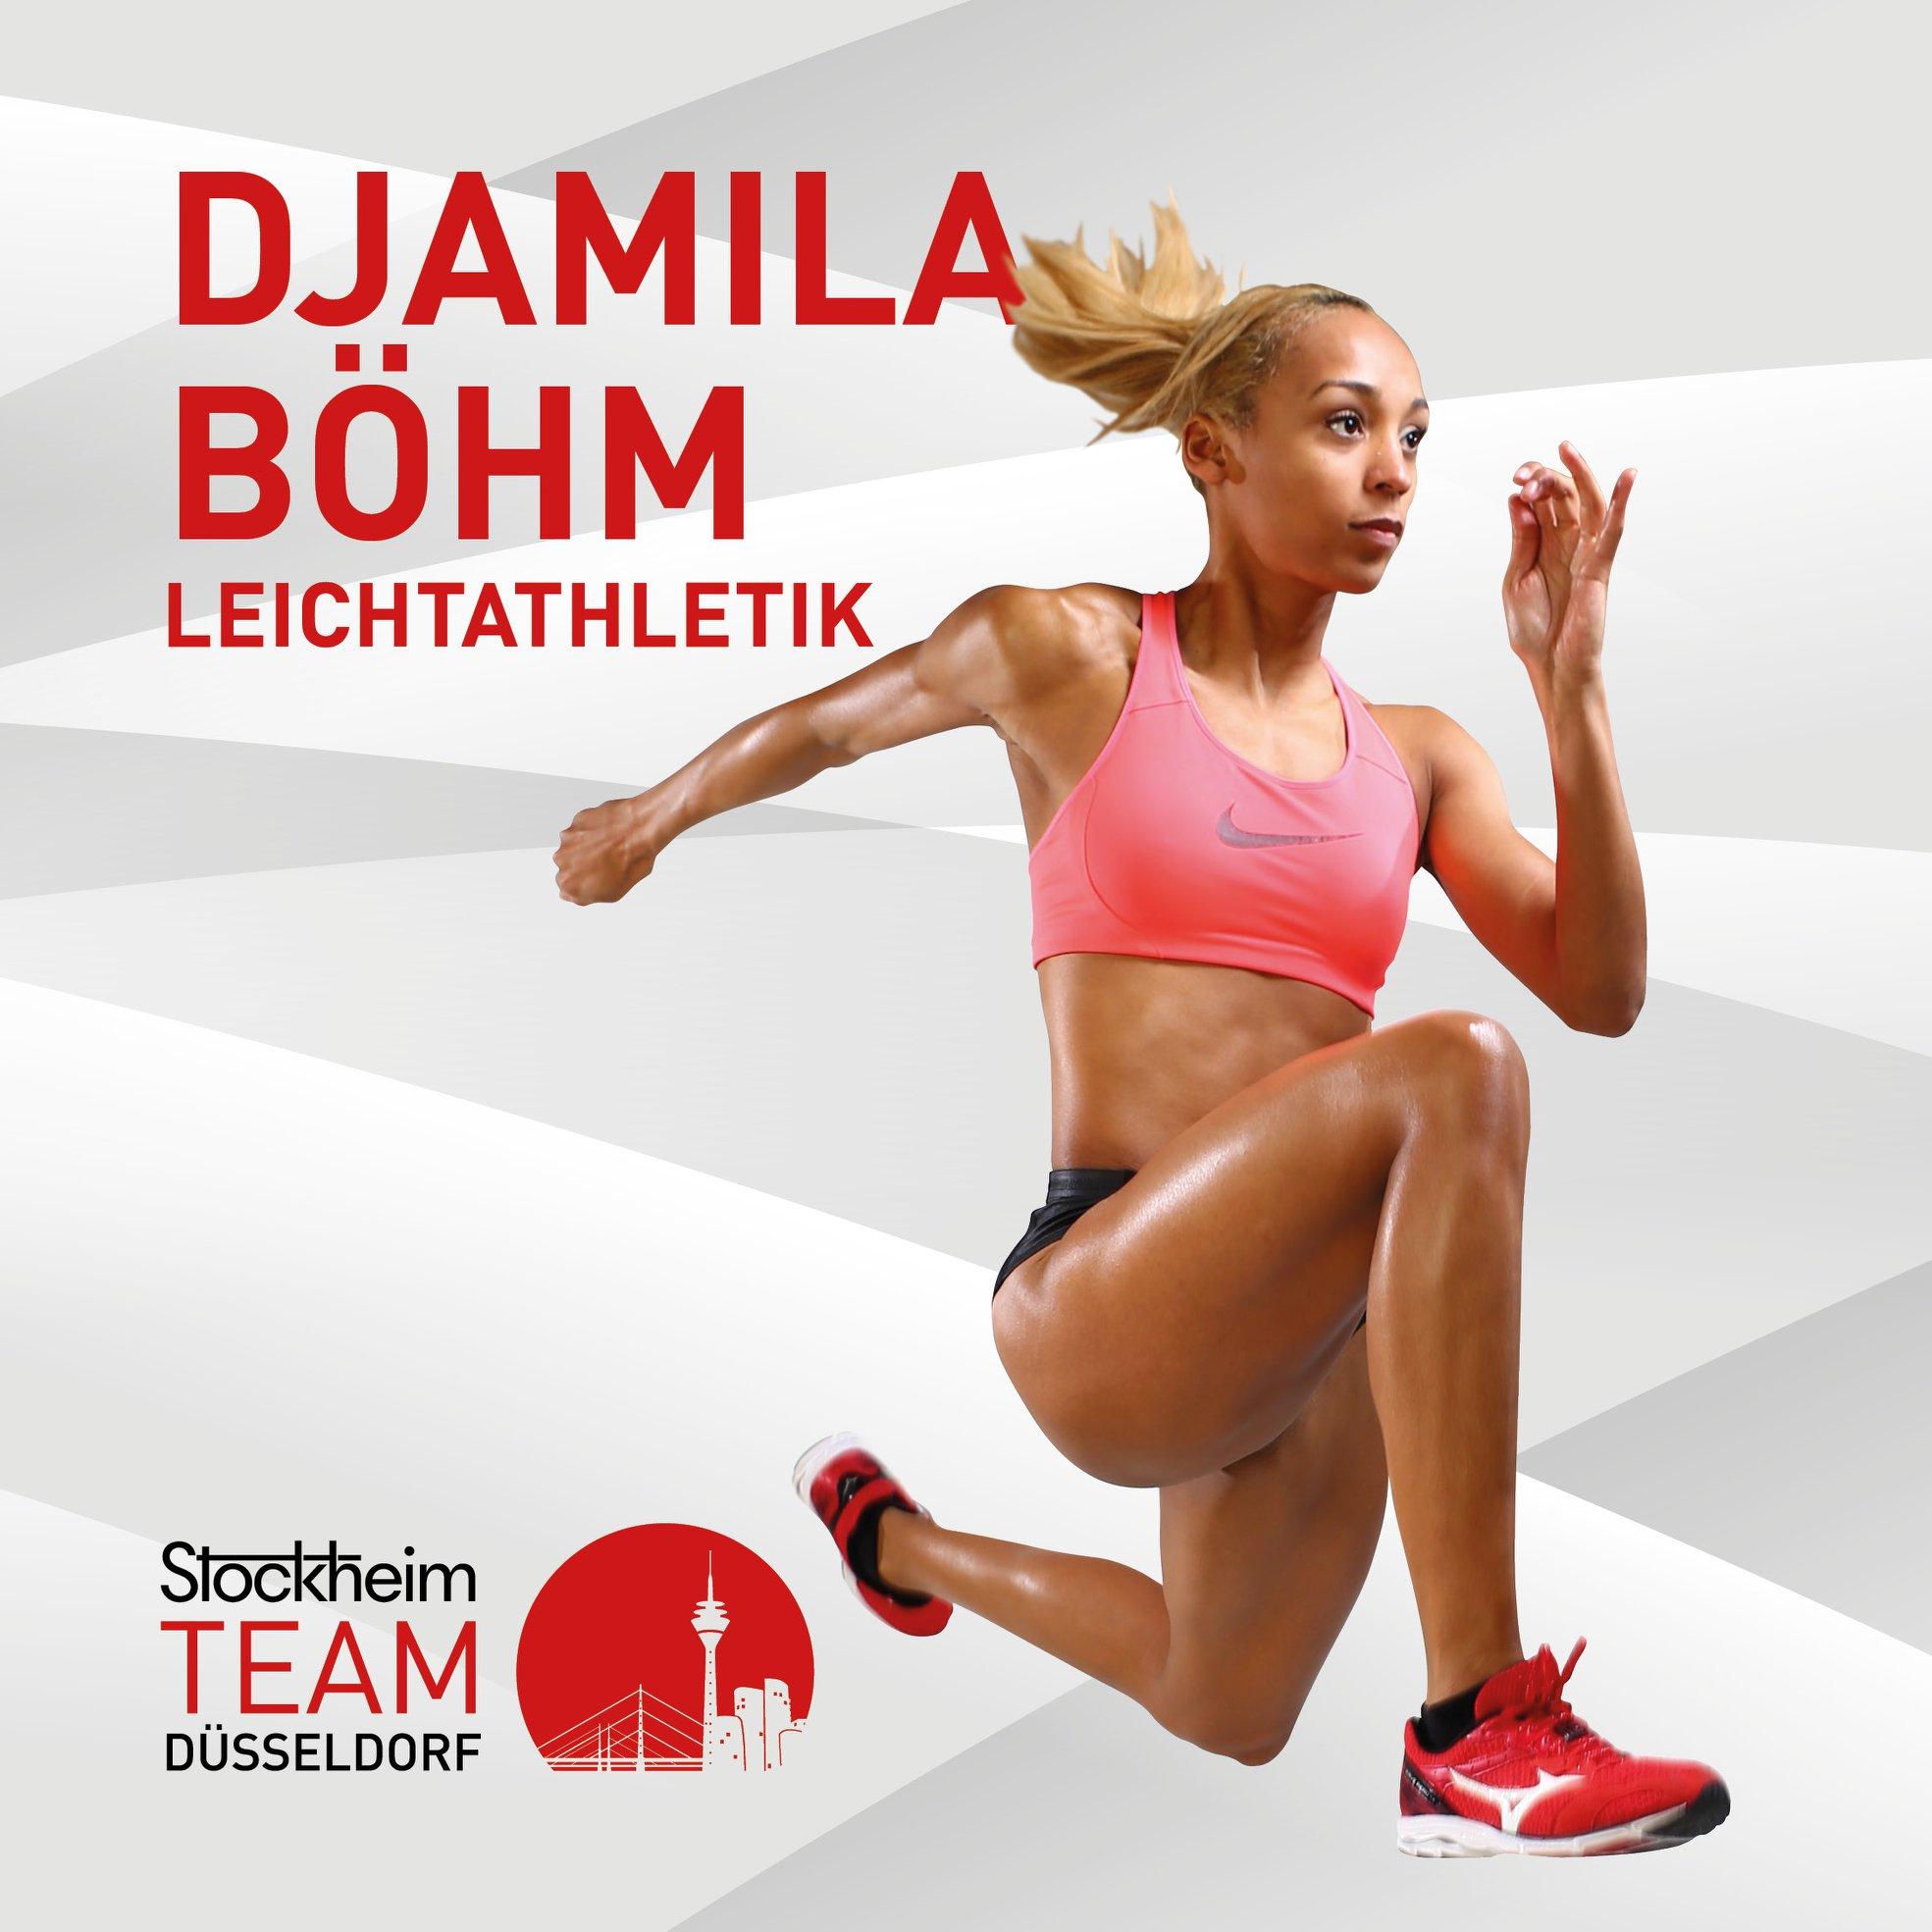 djamila_boehm